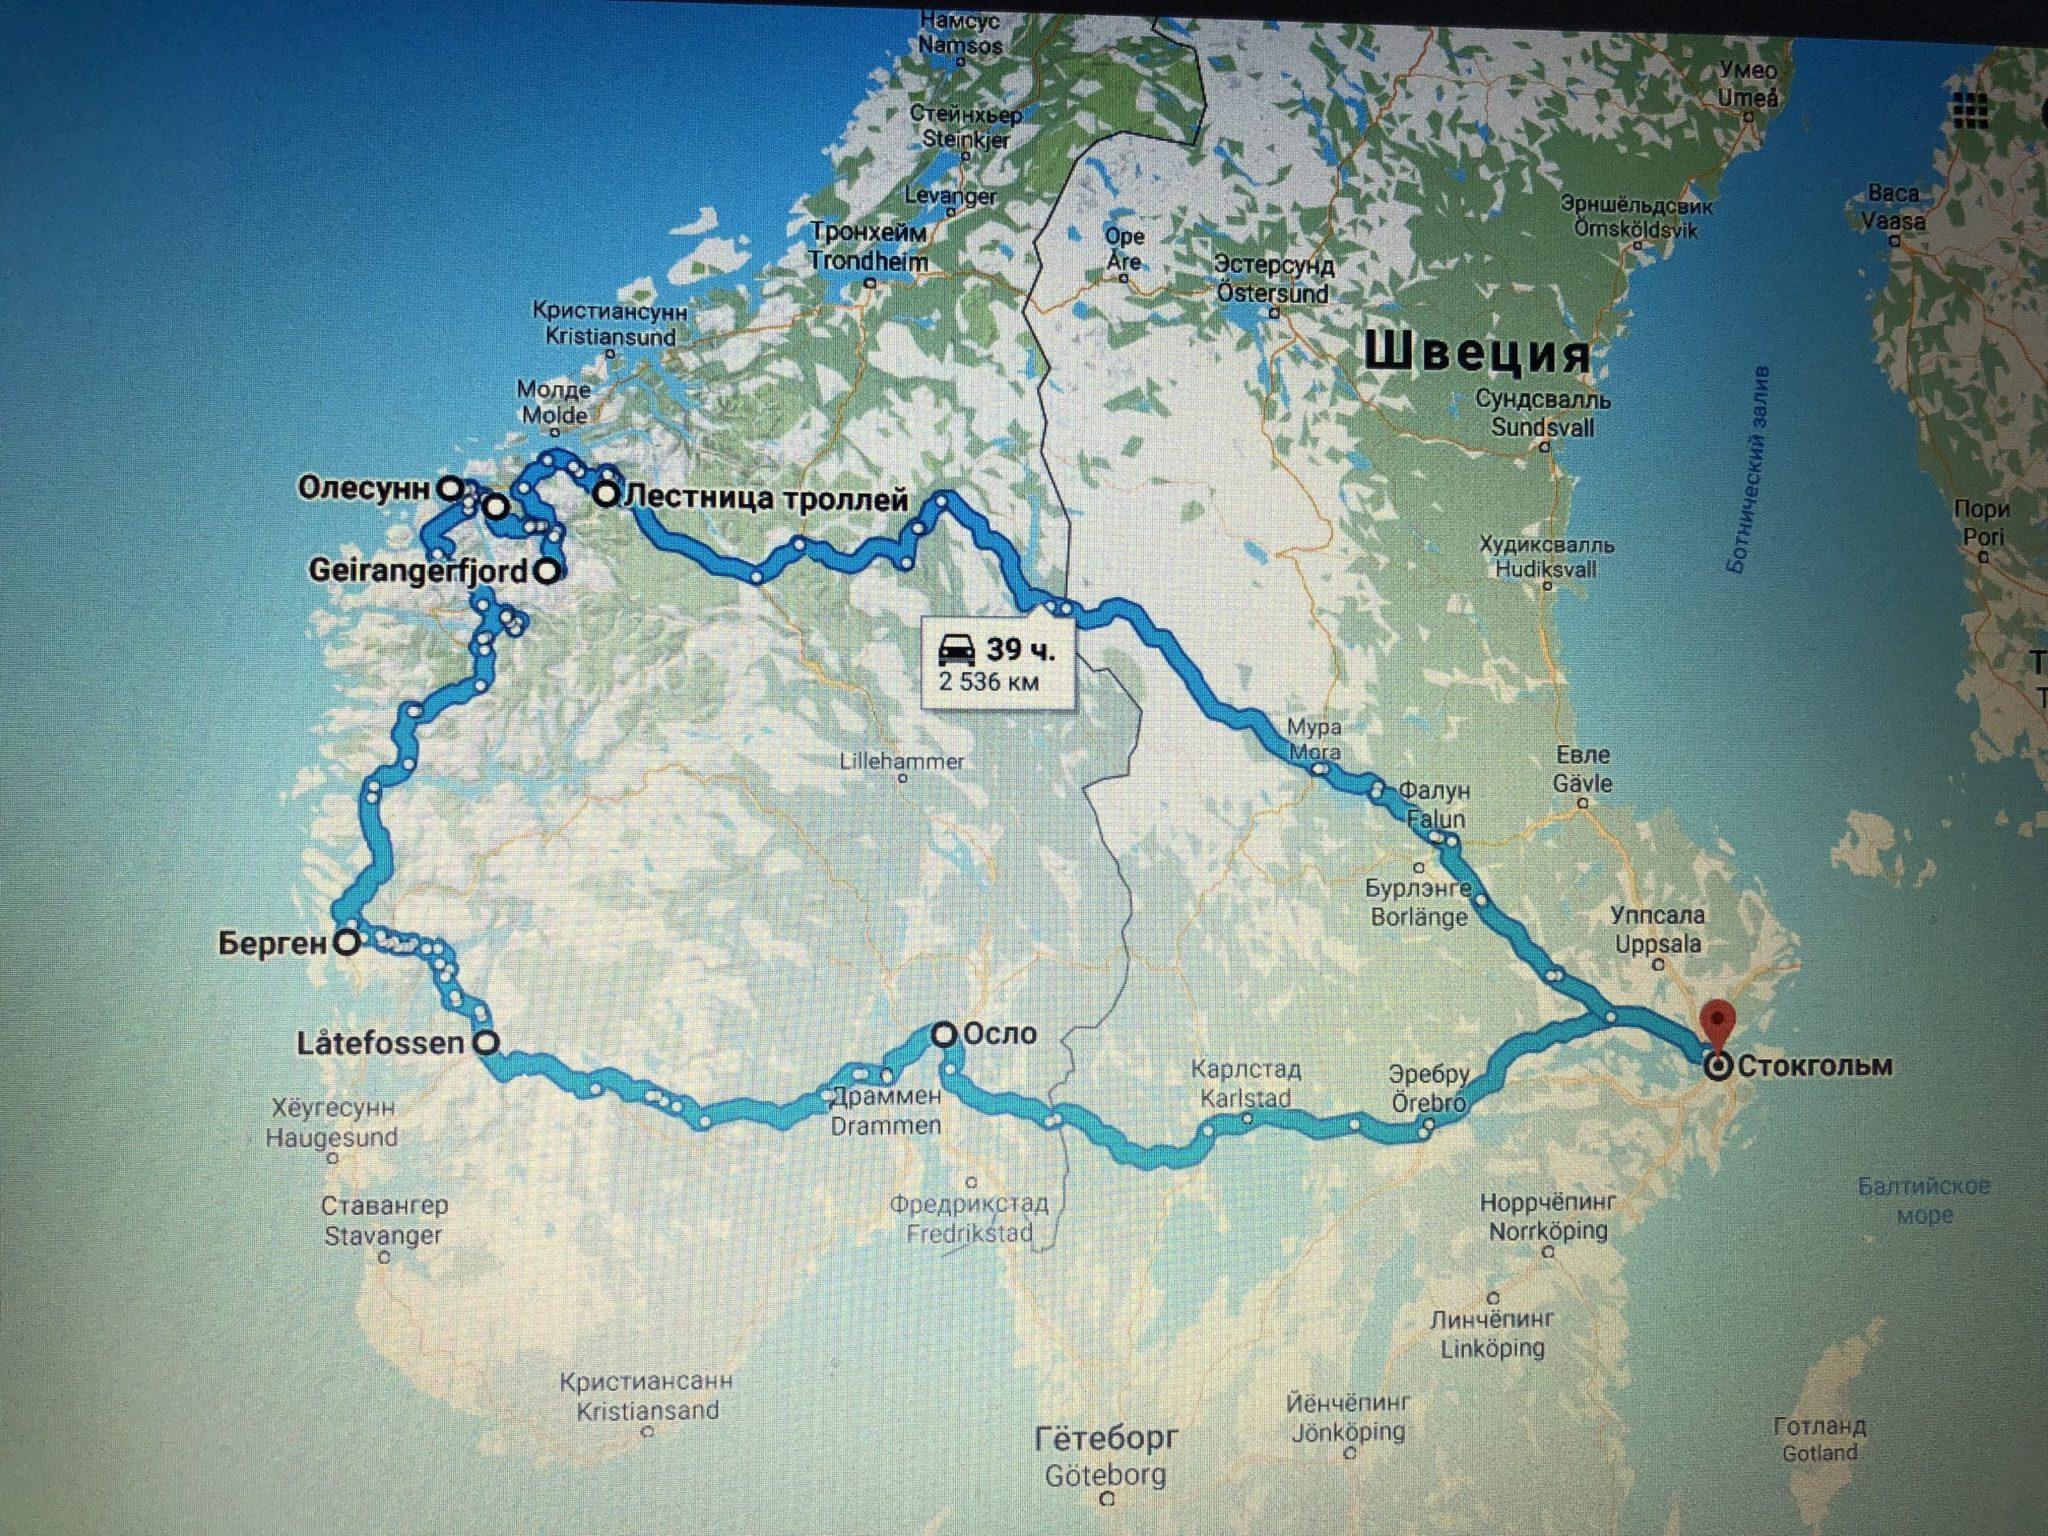 Автопутешествие по Норвегии, маршрут